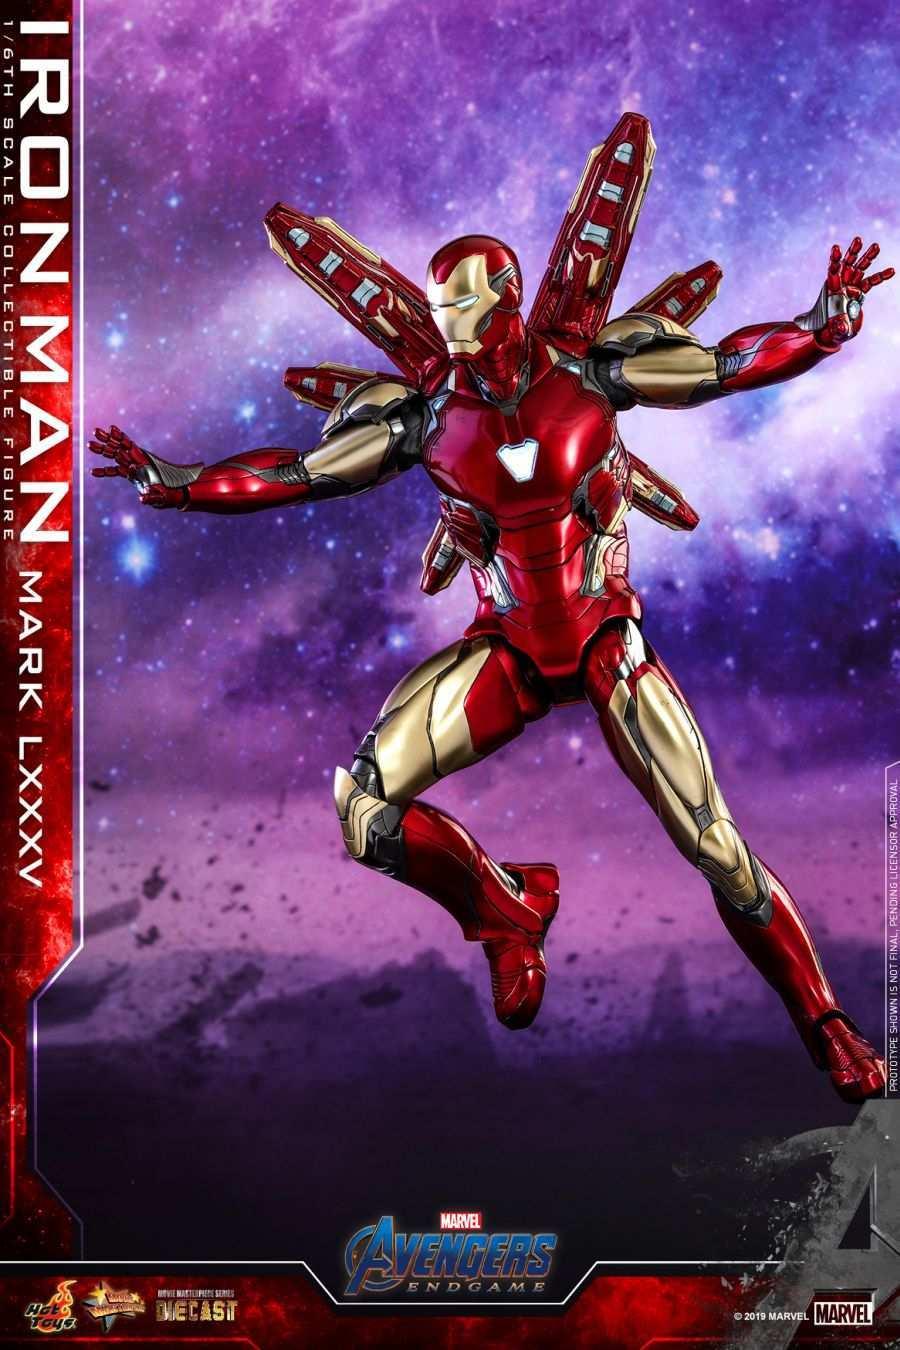 Hot Toys - Avengers 4 - Iron Man Mark LXXXV collectible figure_PR8